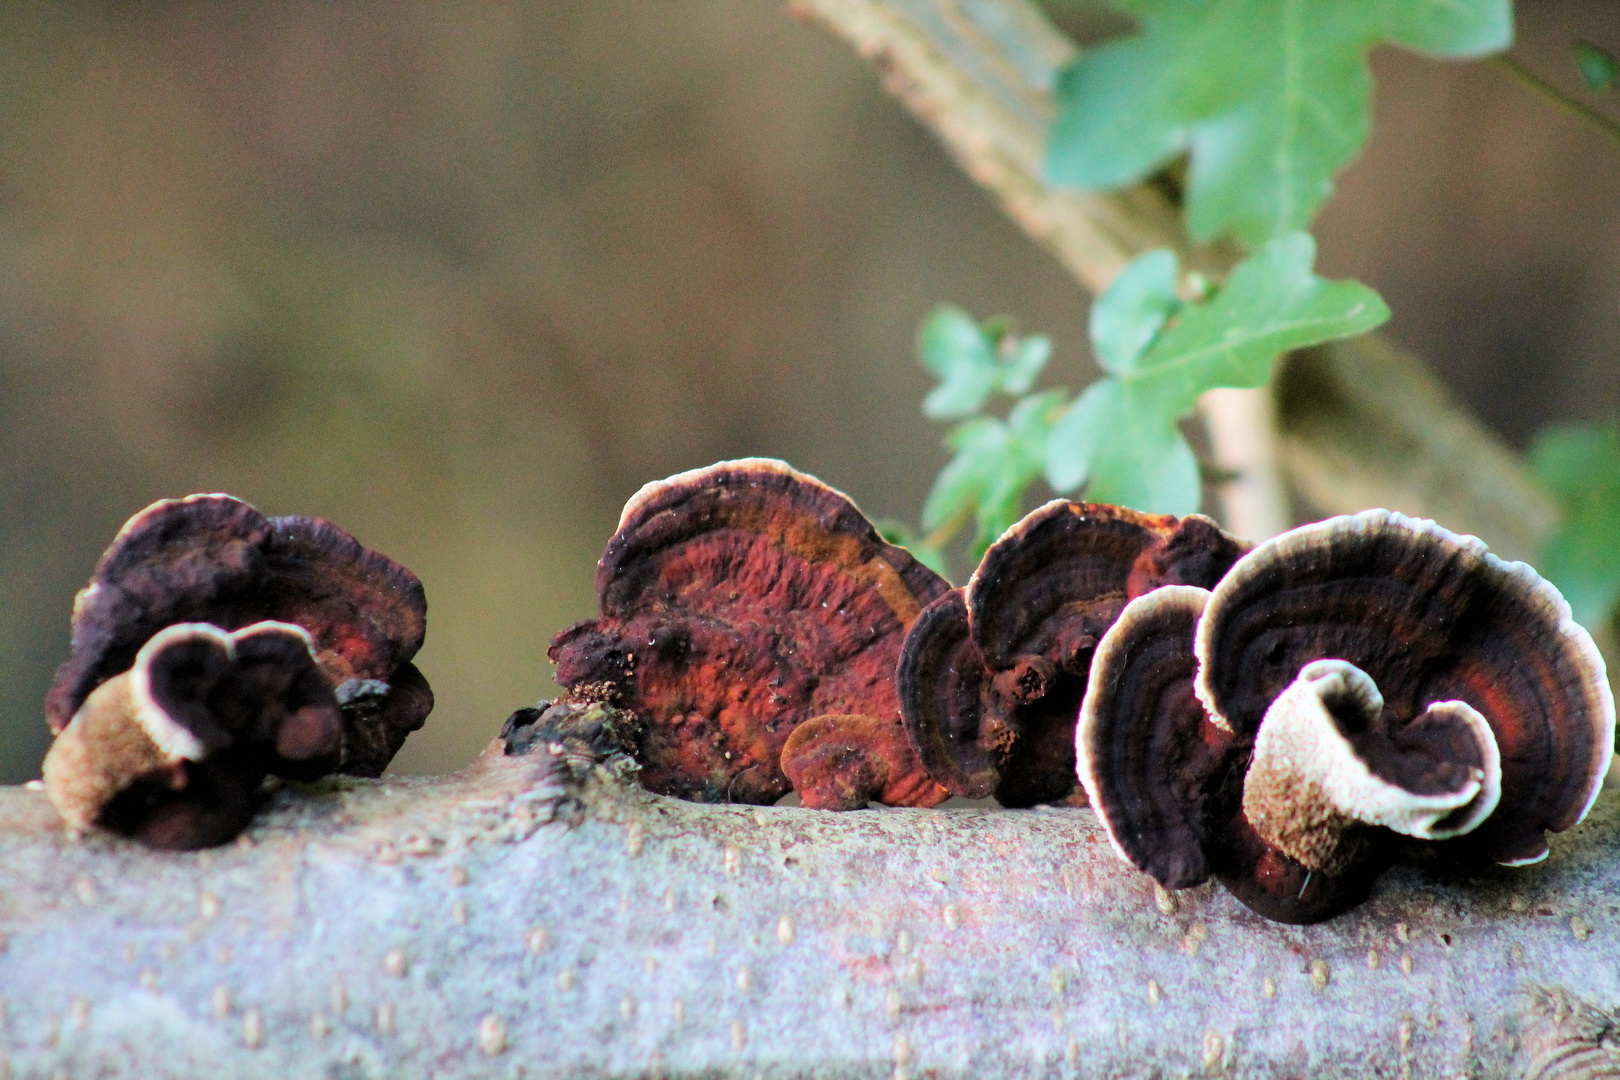 und die anderen Pilze